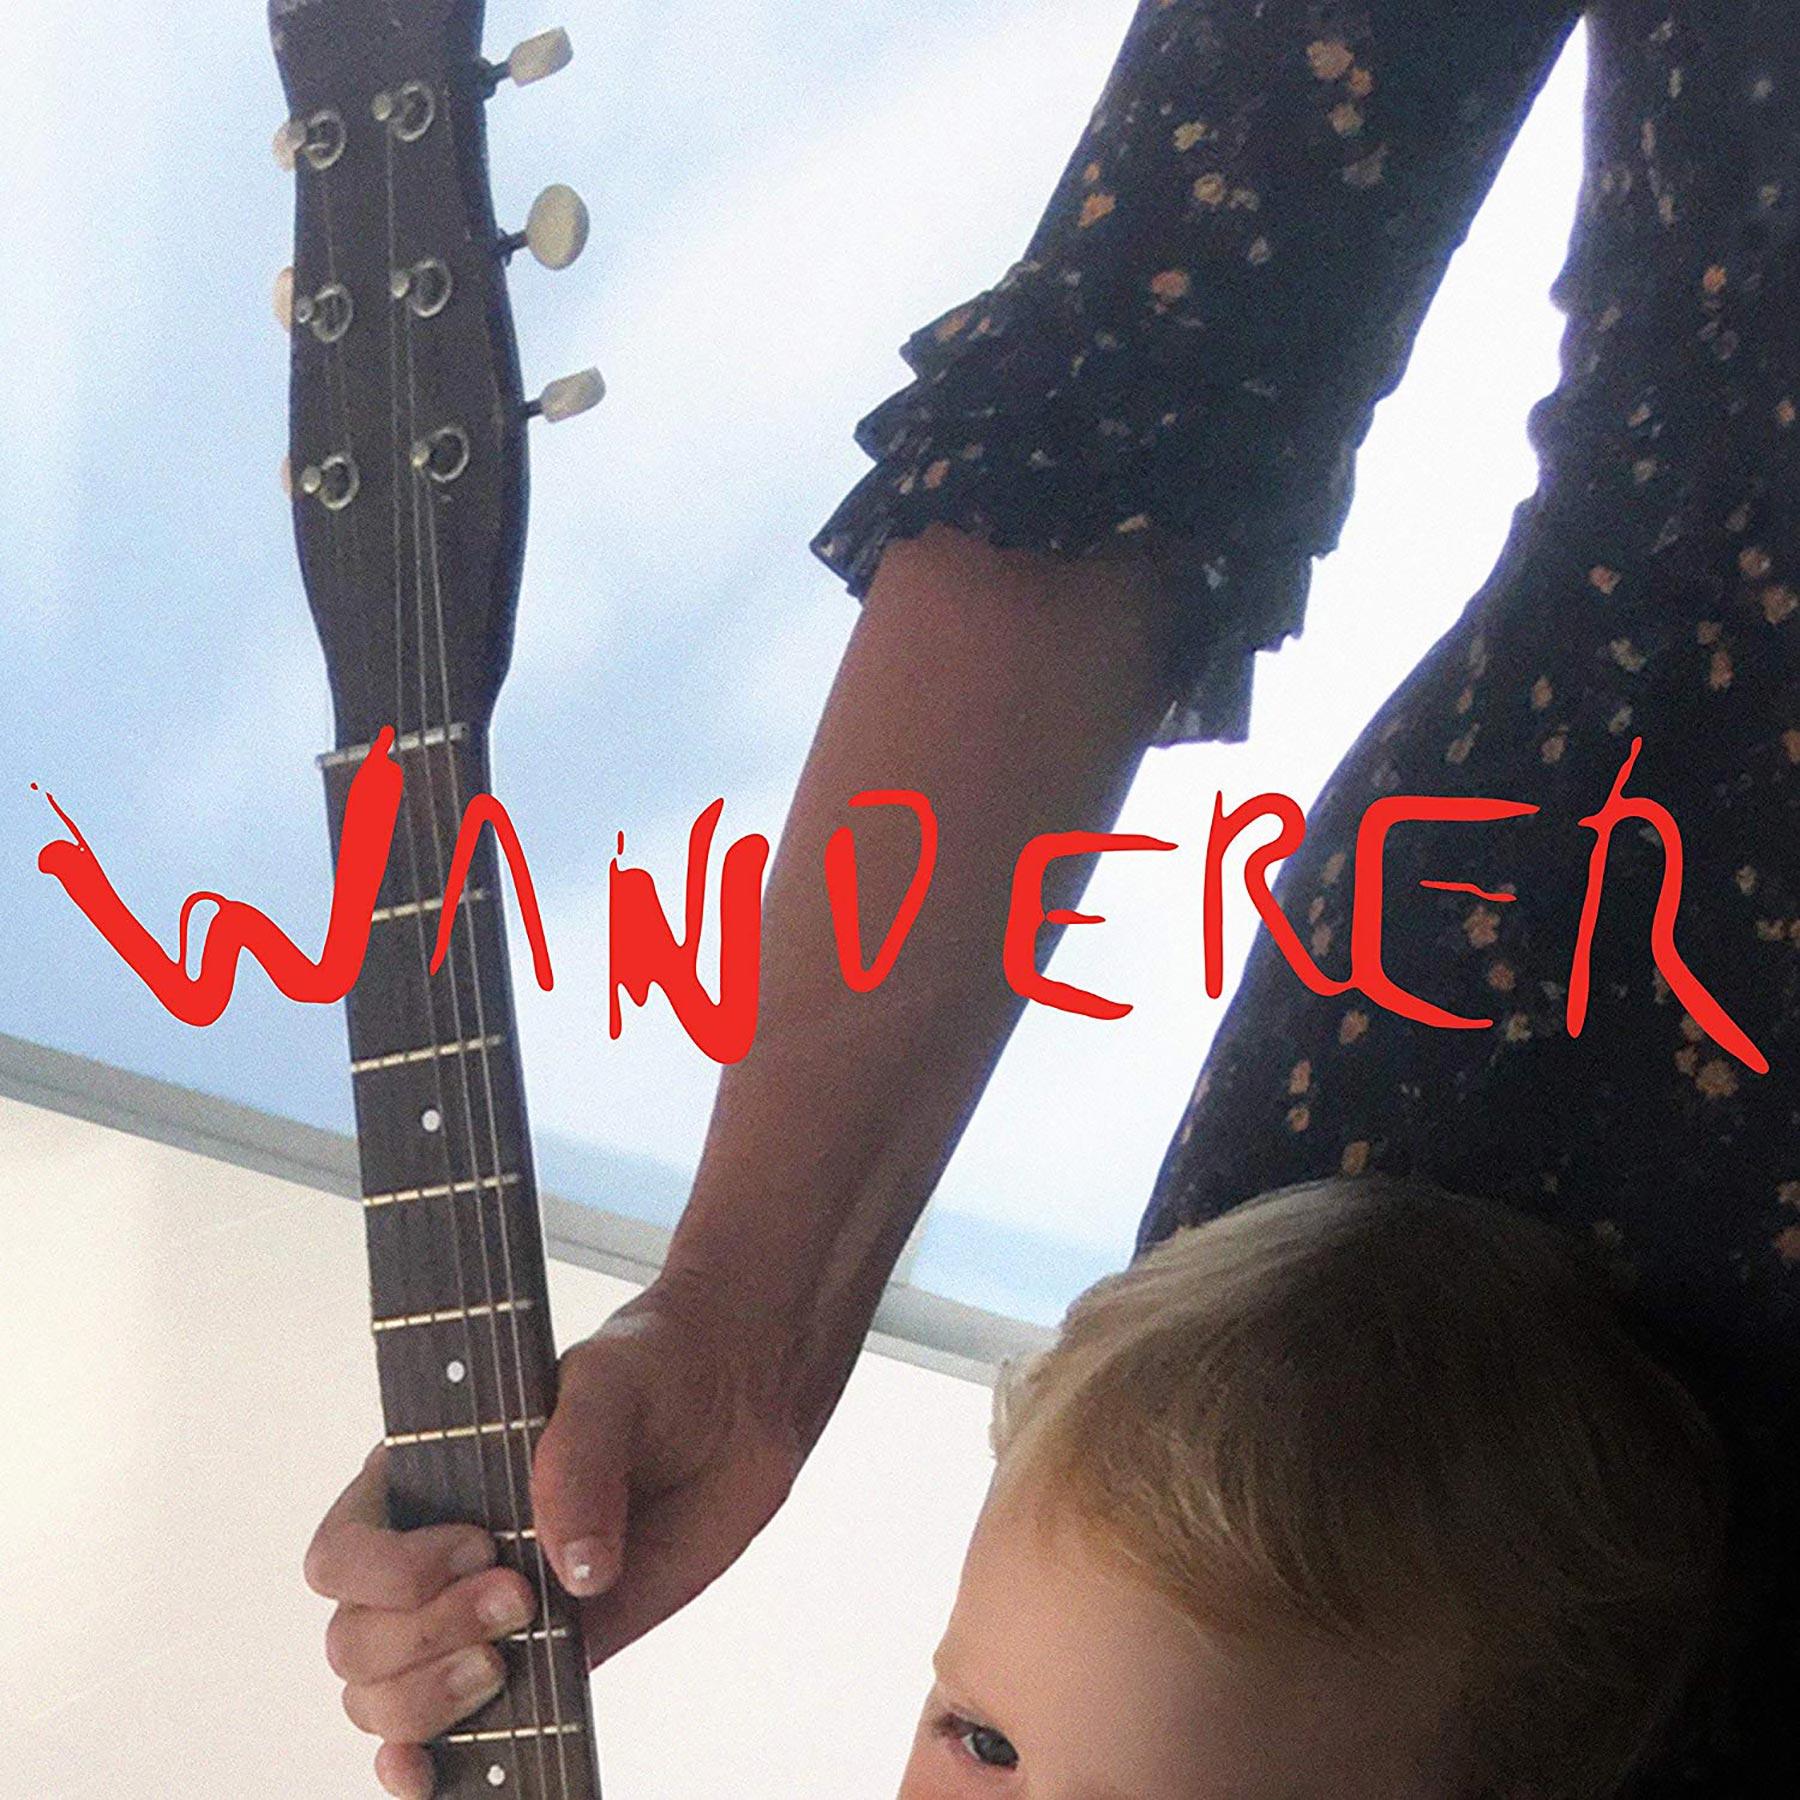 Cat Power, WandererCR: Domino Recording Co.